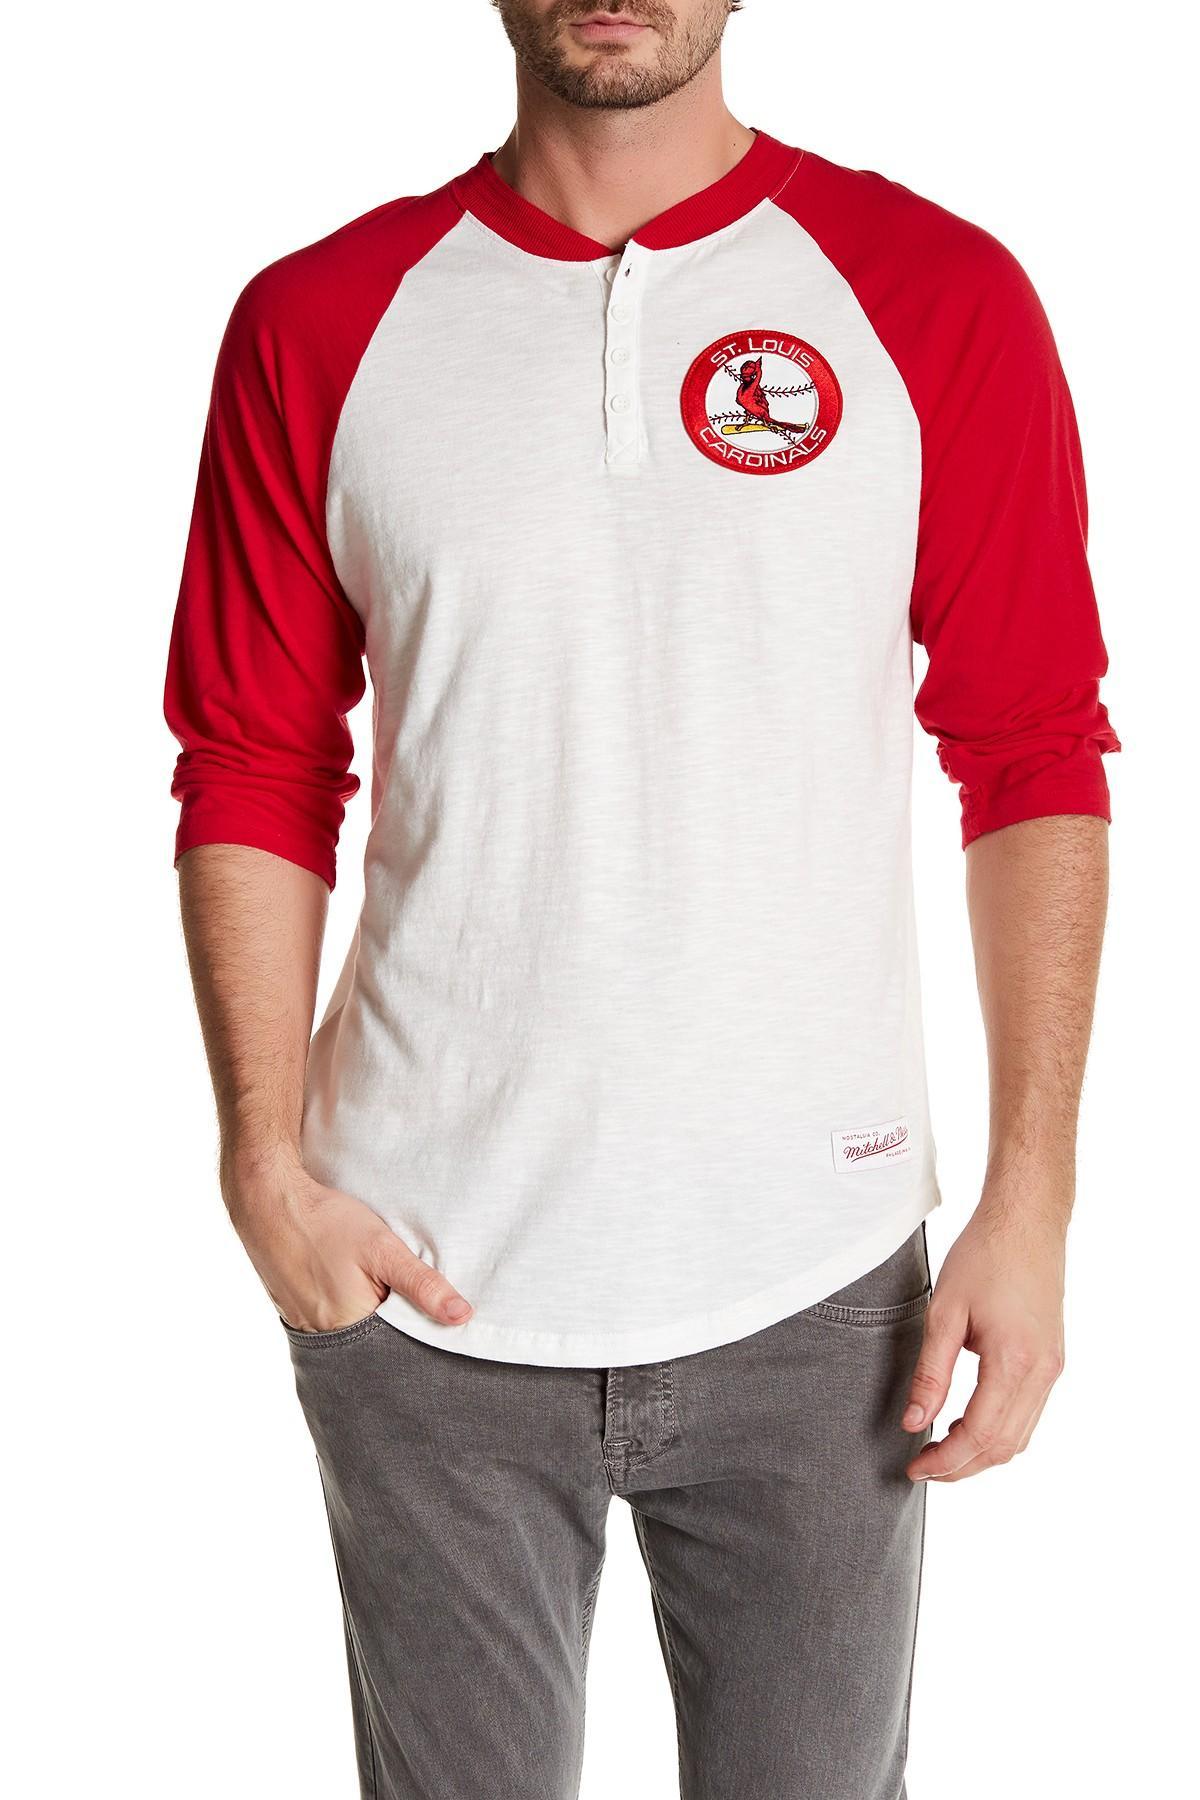 f447d52f Lyst - Mitchell & Ness Mlb Cardinal Unbeaten Henley Shirt in Red for Men